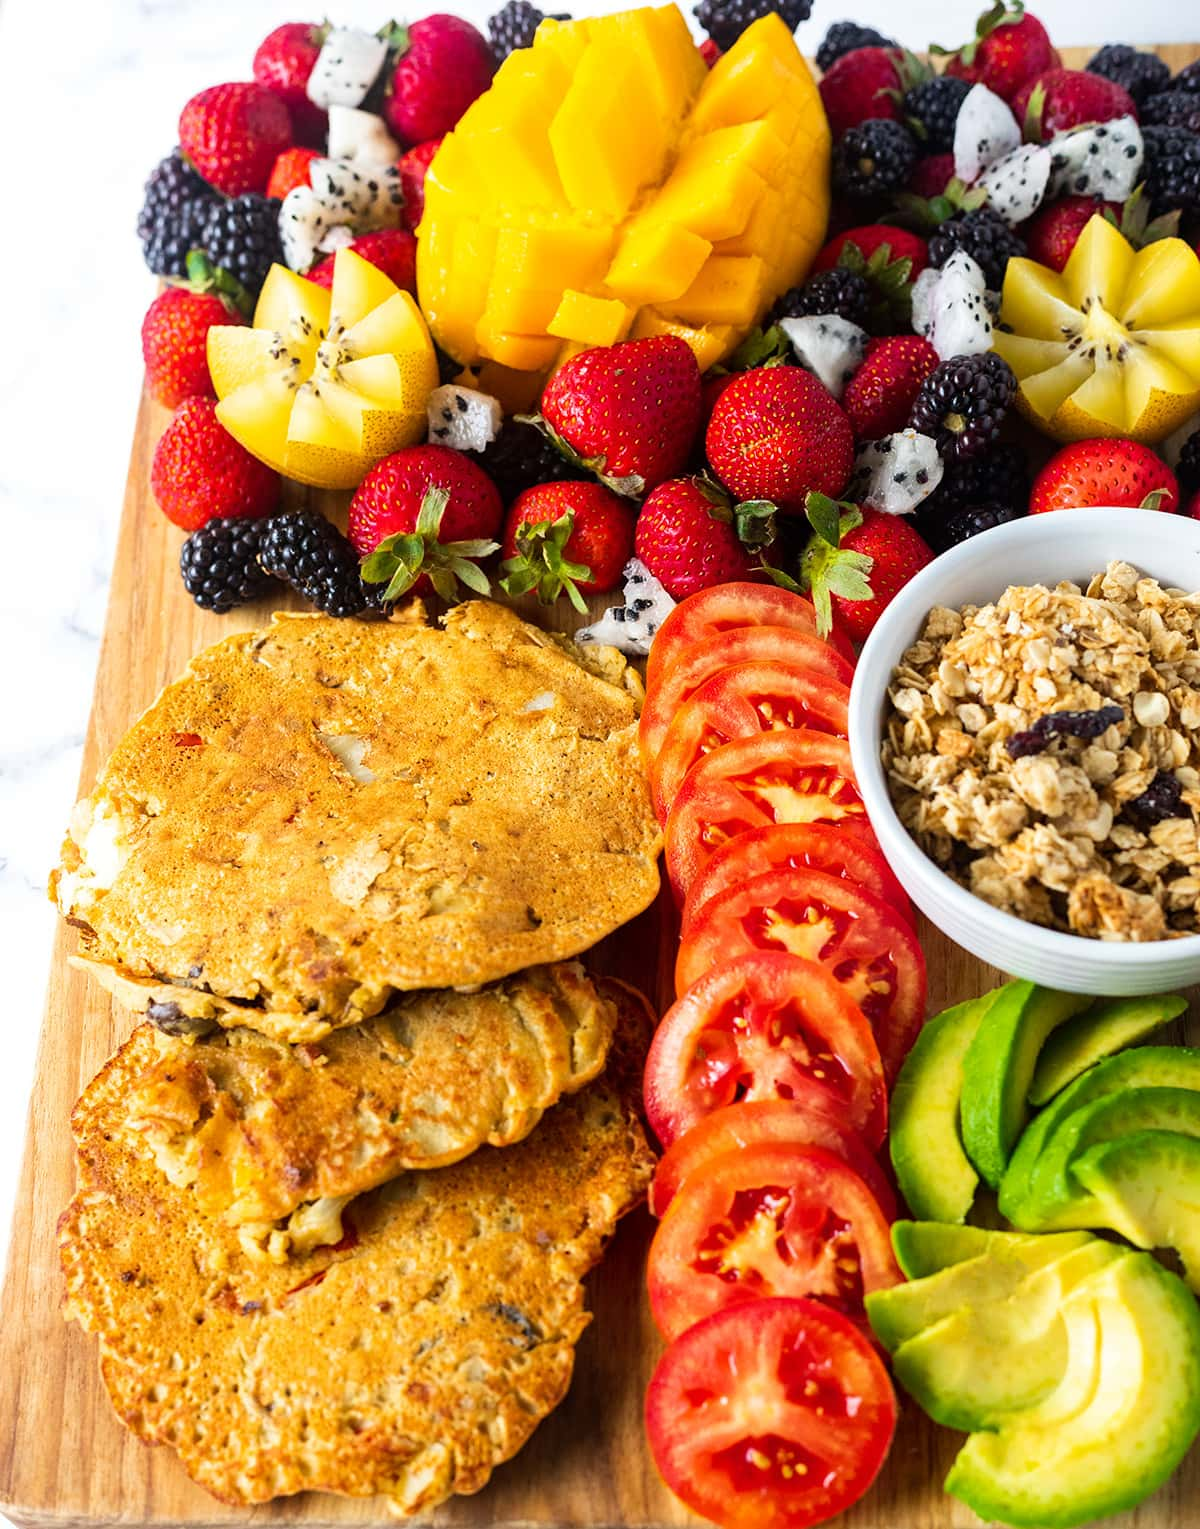 chickpea pancakes on a board, with tomato slices, avocado, granola in a white bowl, strawberries, blackberries, mango, yellow kiwi and dragon fruit